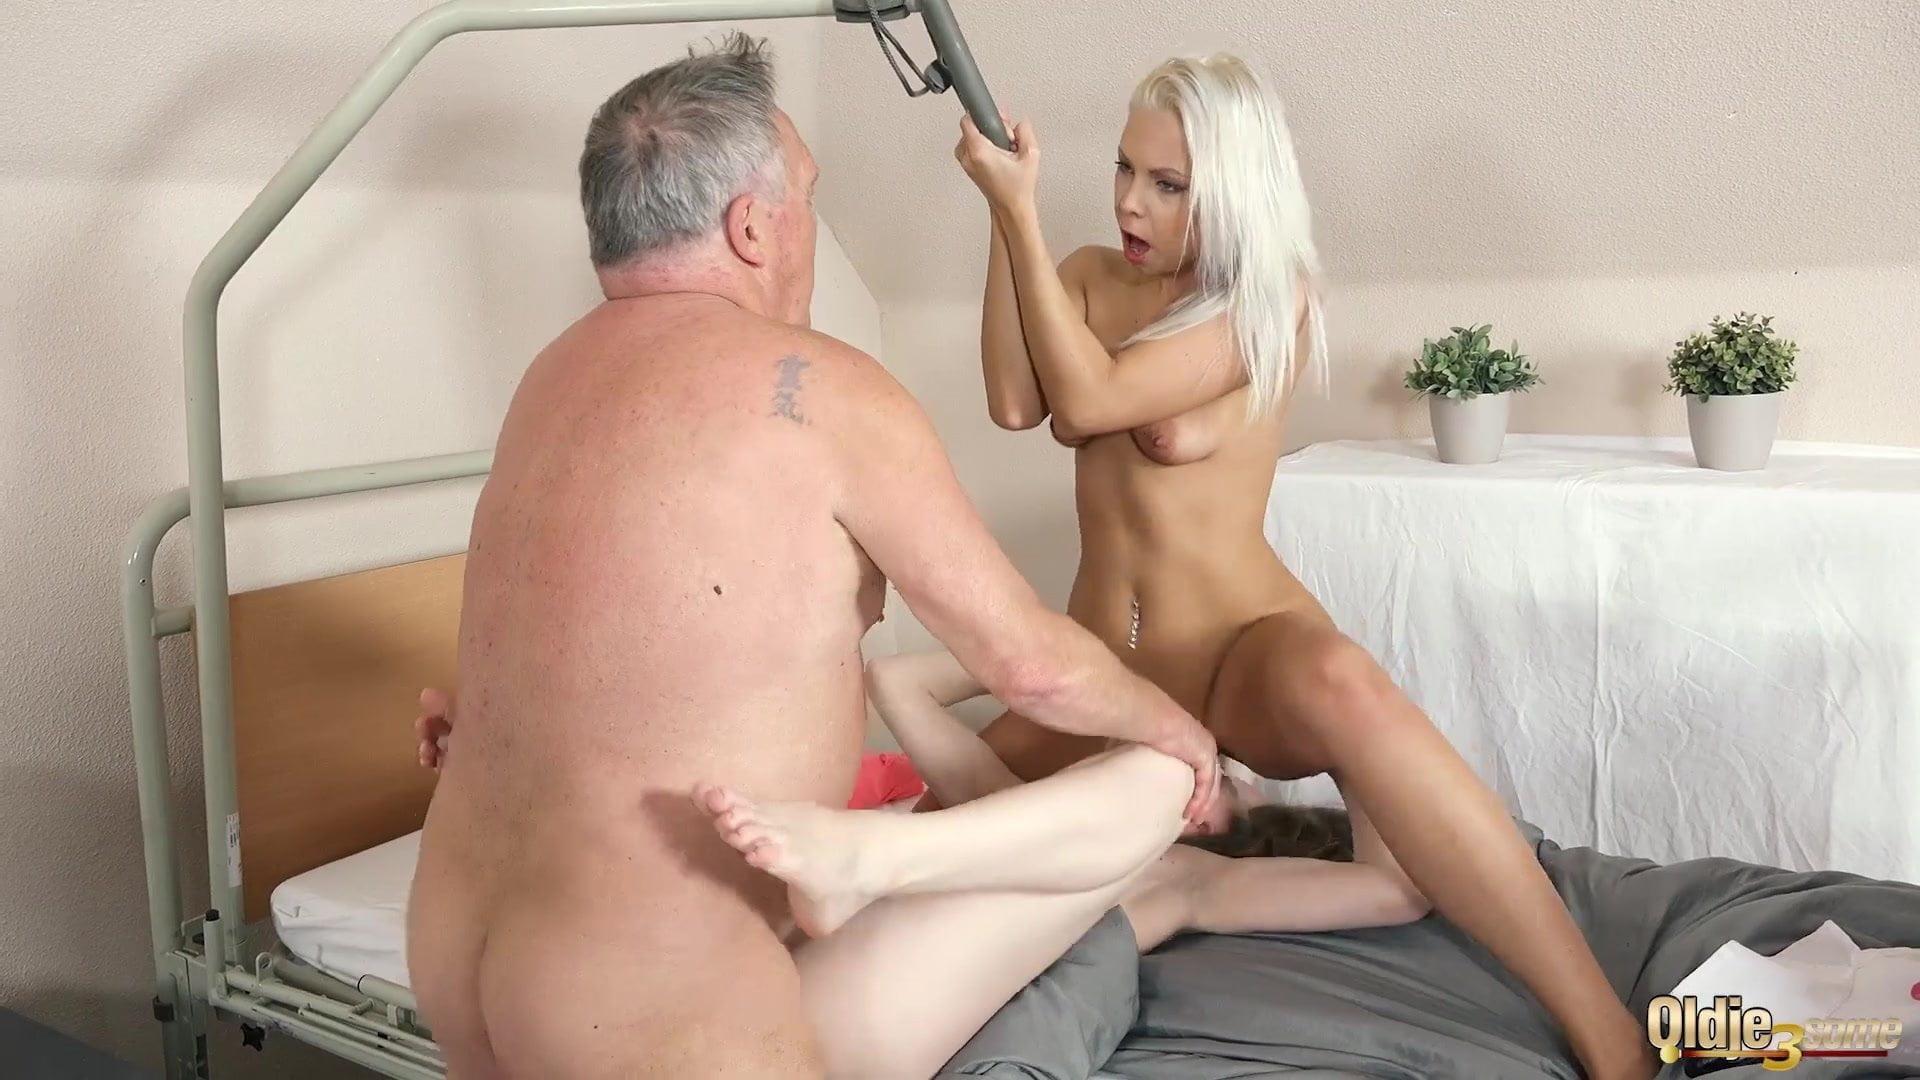 Wife Pegging Husband Threesome